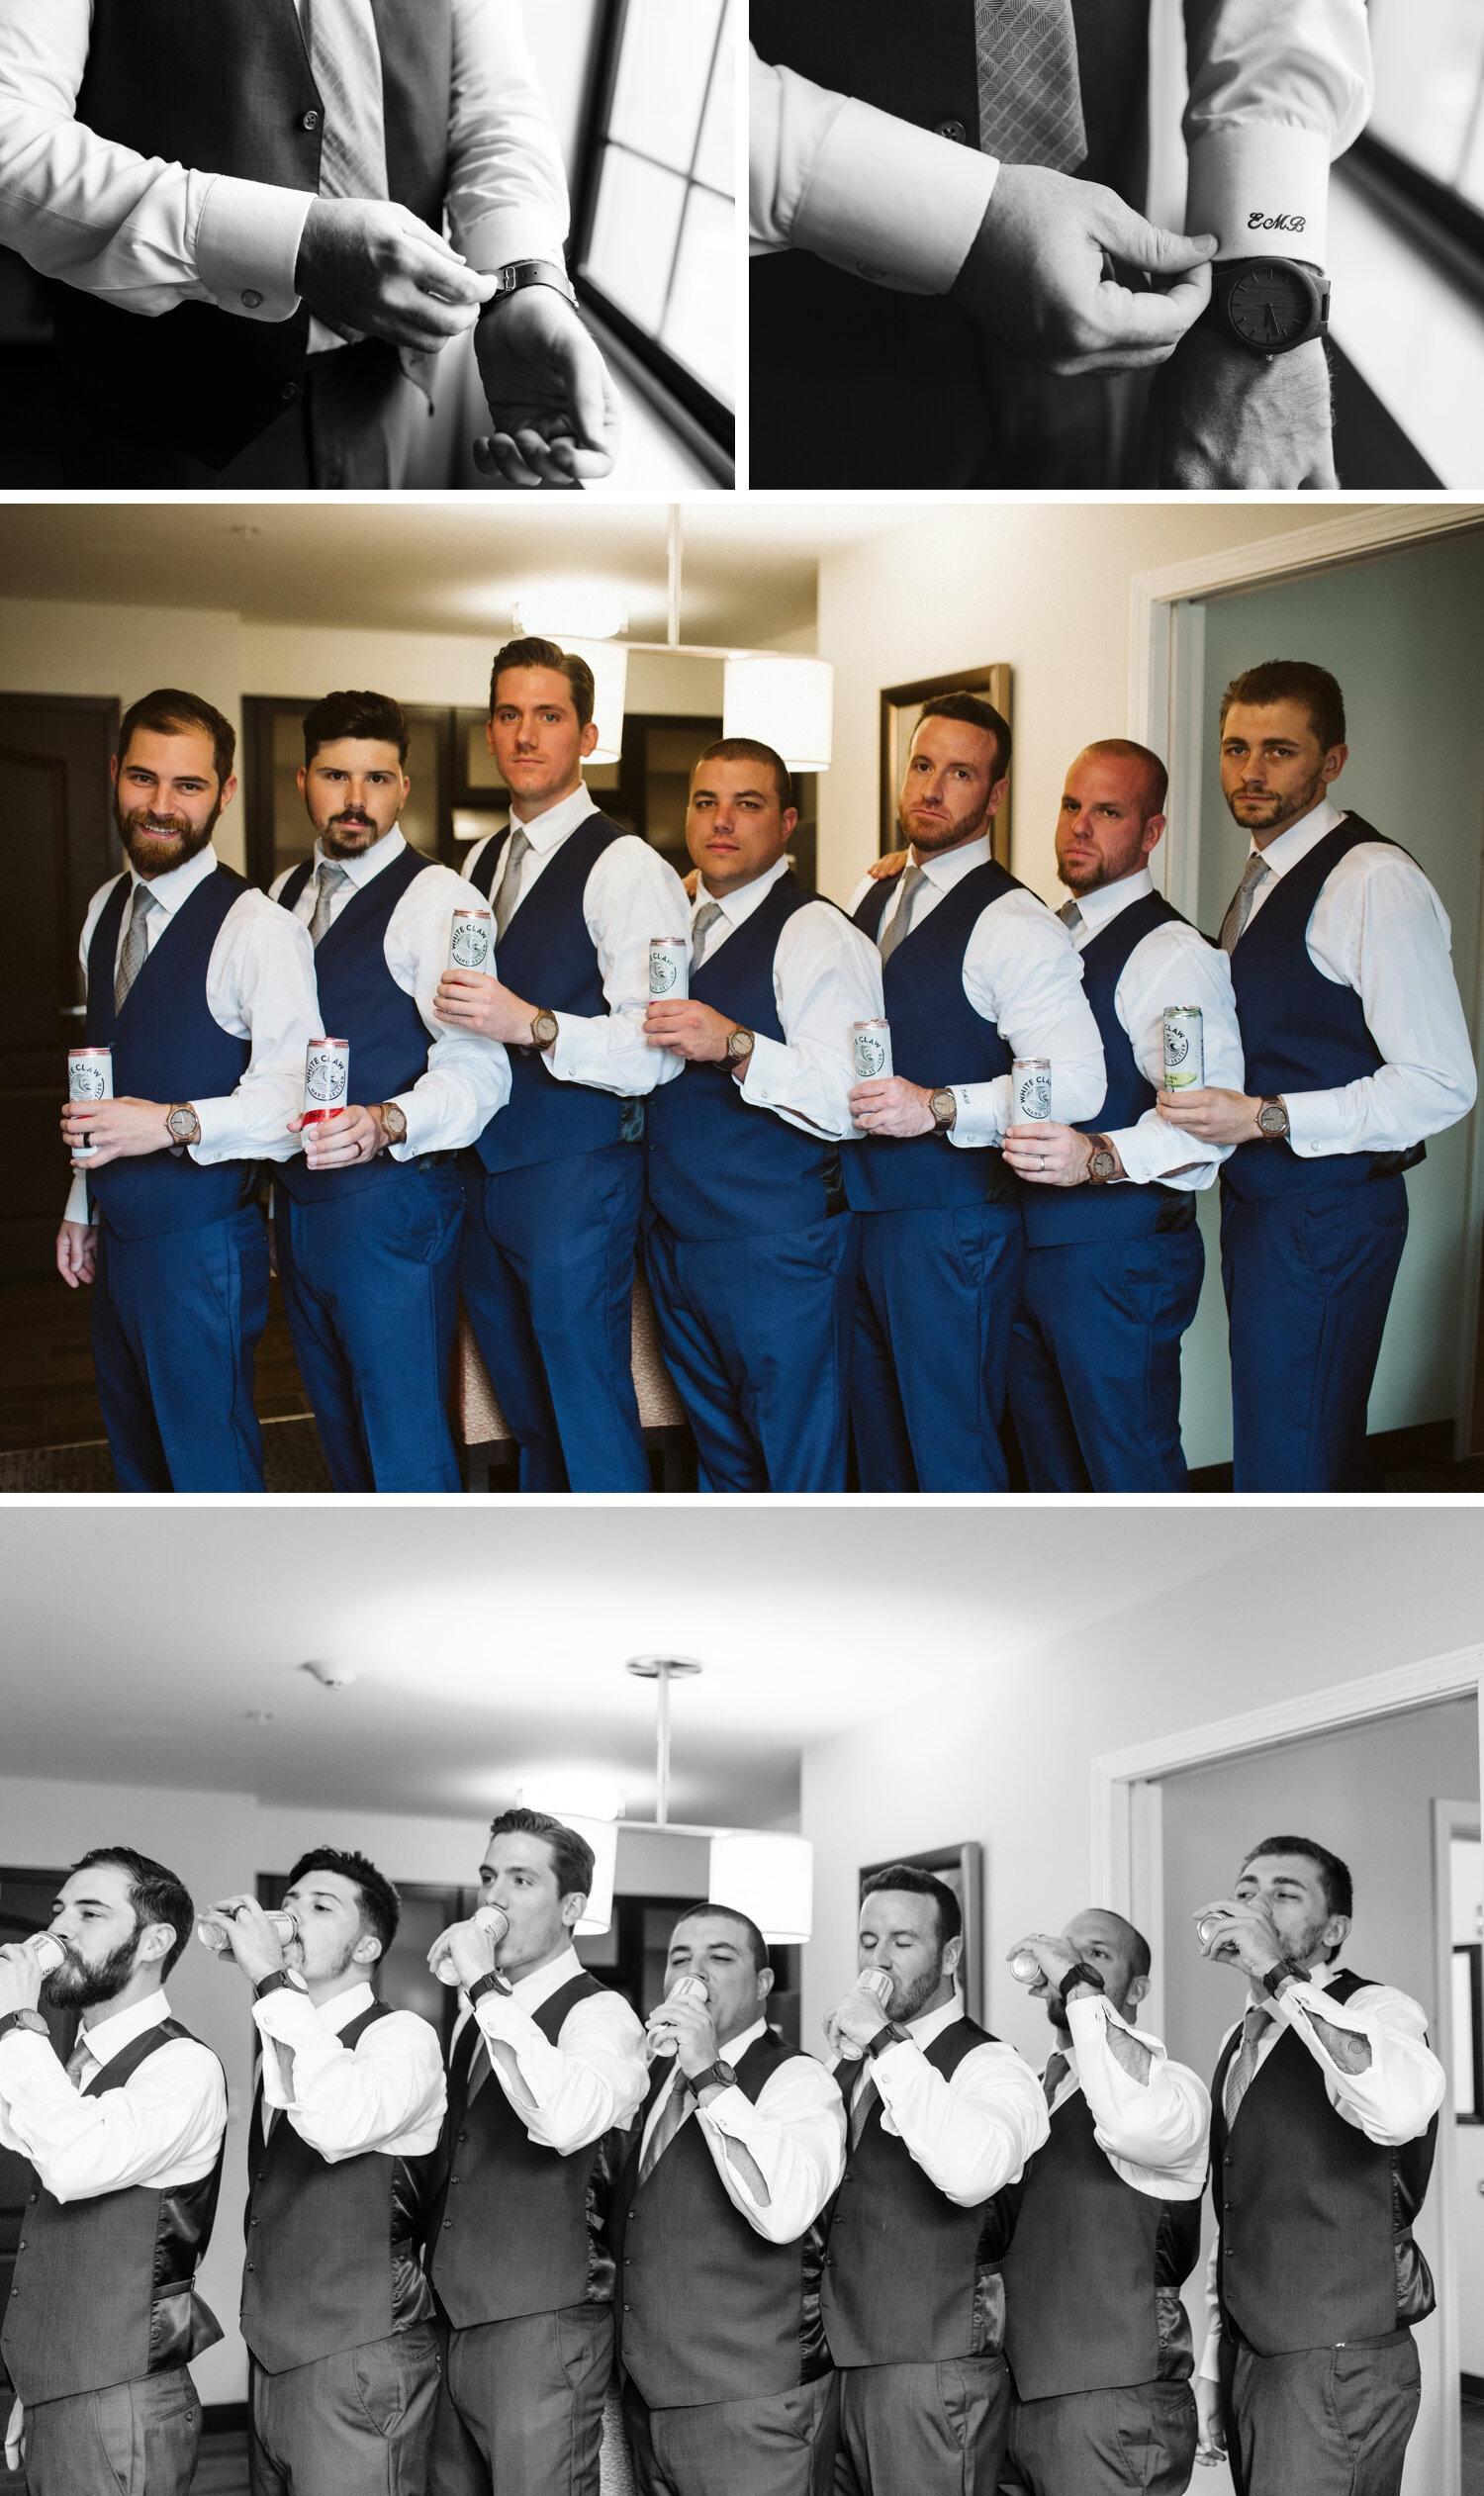 Groom and groomsmen photos